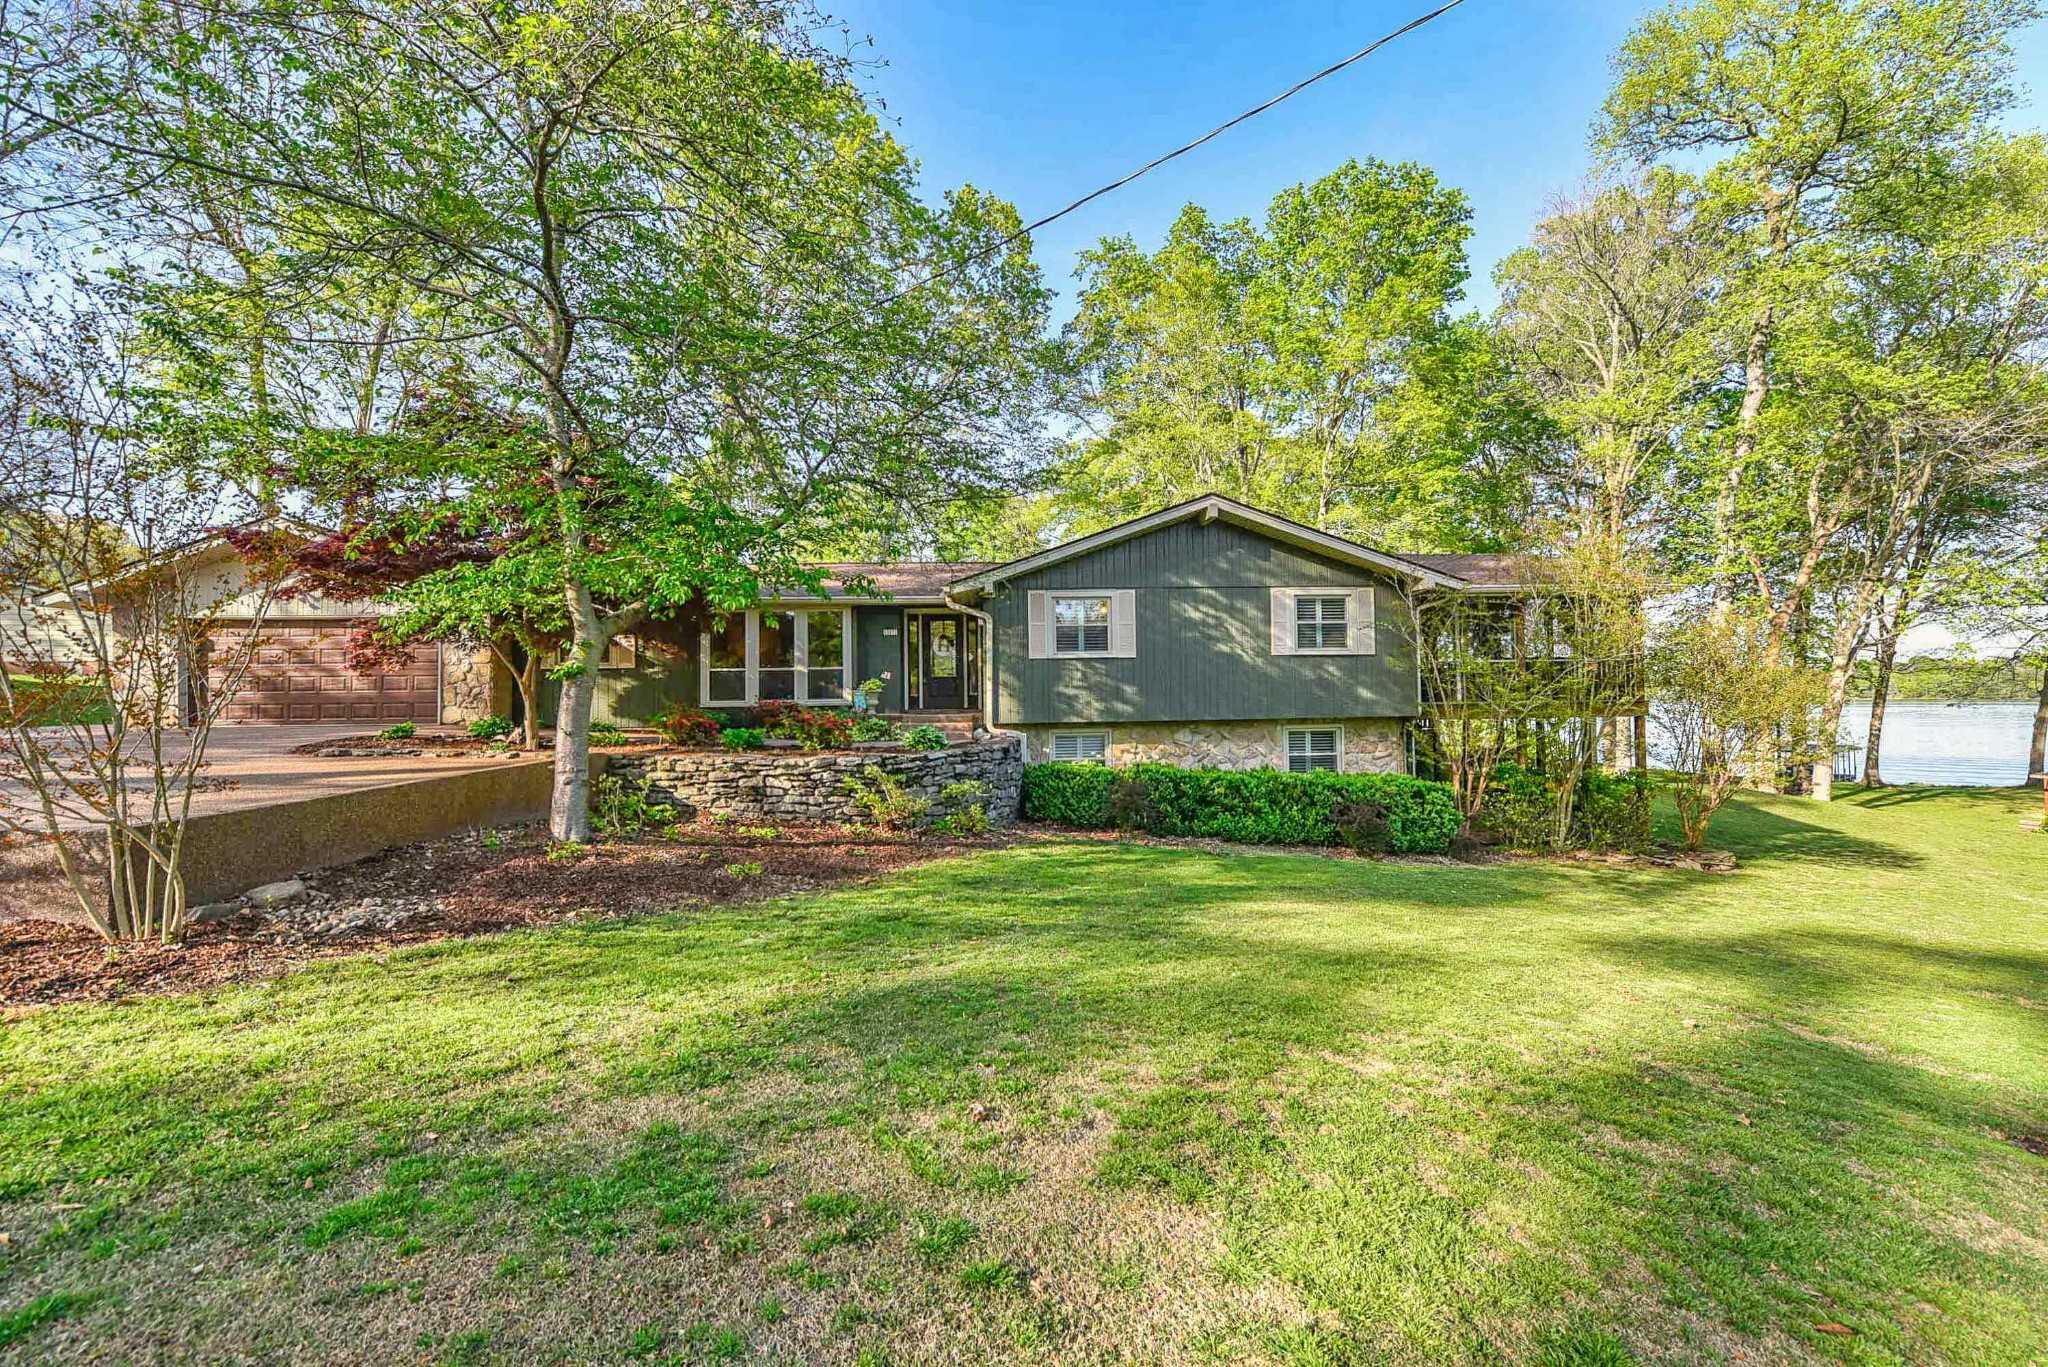 $1,150,000 - 4Br/3Ba -  for Sale in Indian Lake Forest Sec 5, Hendersonville